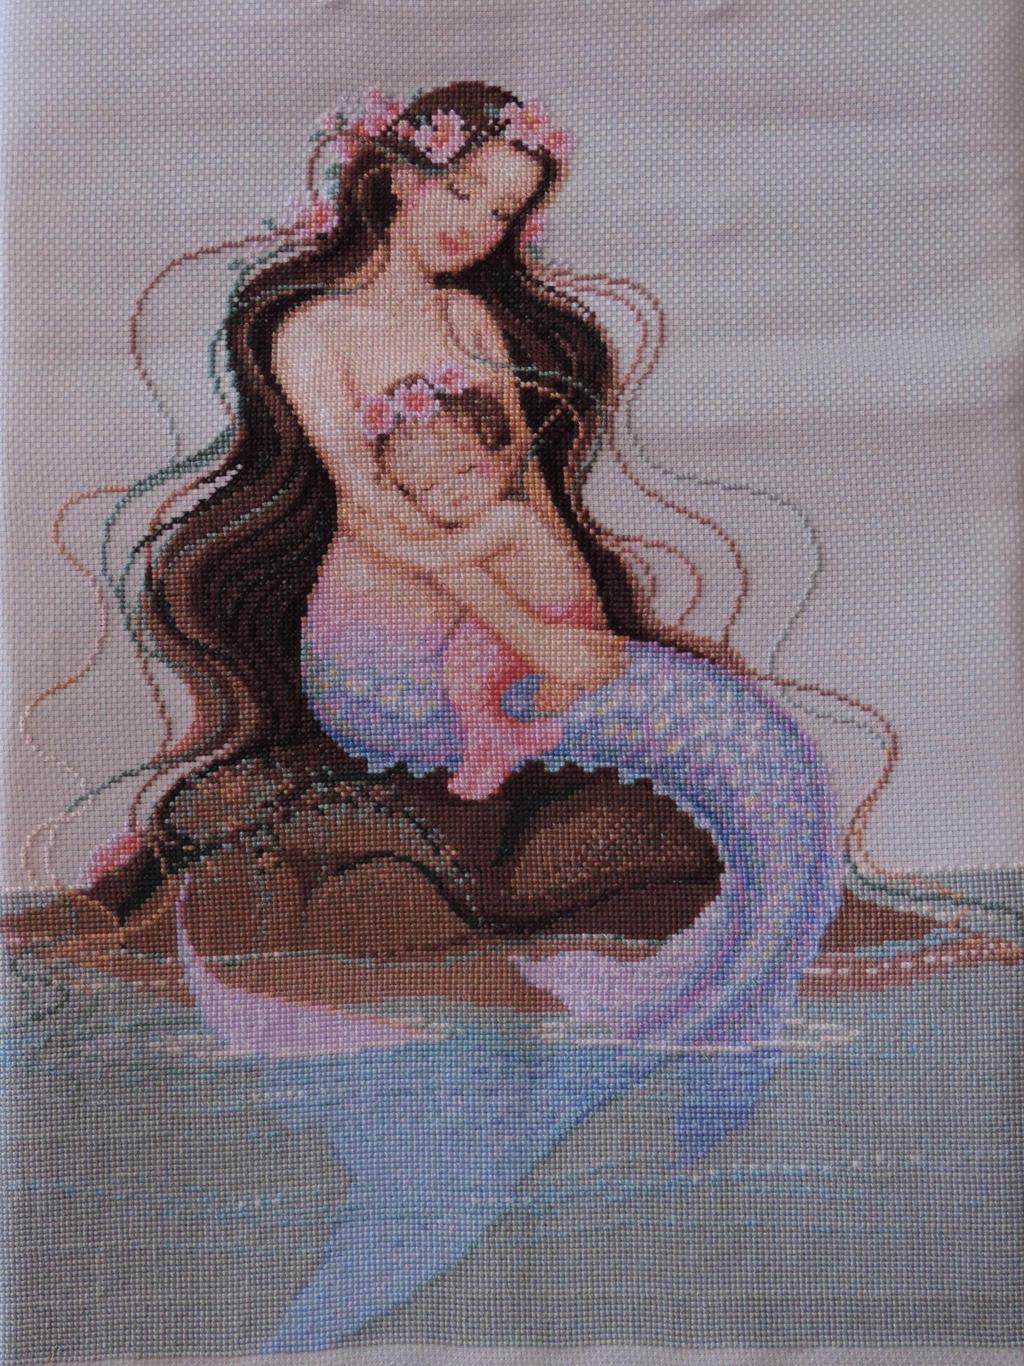 Mermaid Cross-Stitch by MalteseSparrow